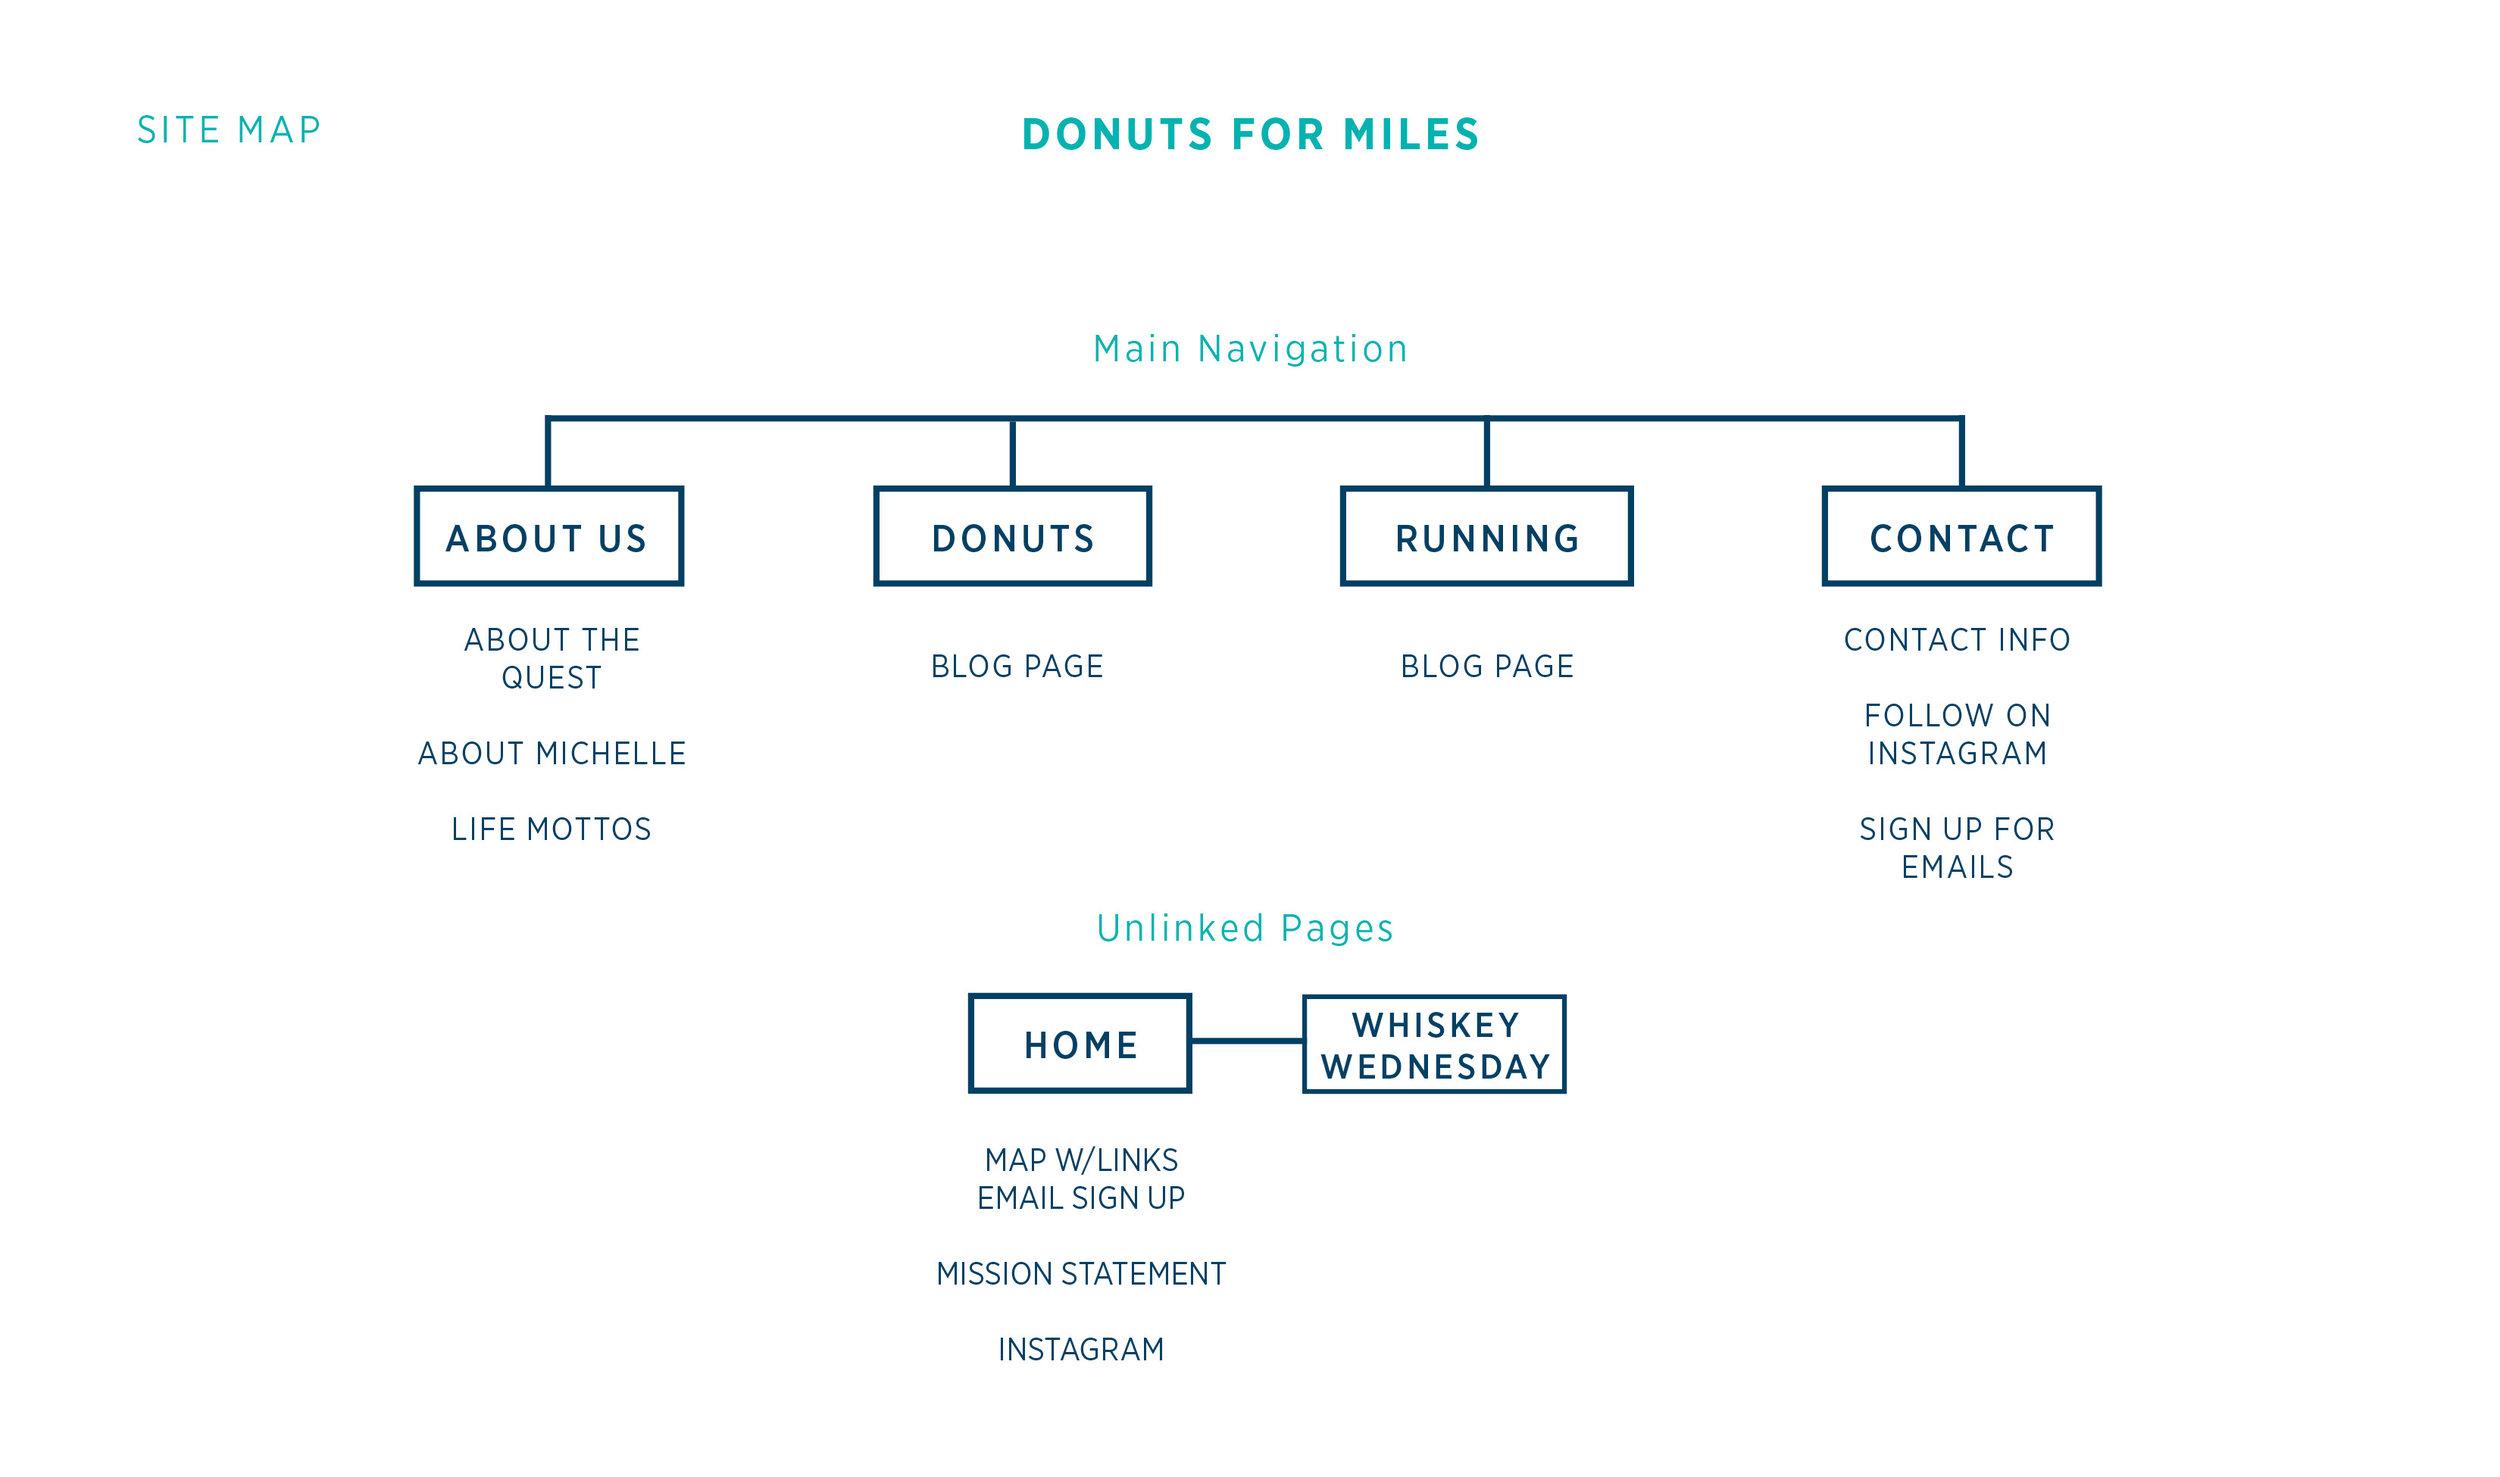 Site Map for Donuts for Miles | Branding by Casi Long Design | www.casilong.com #casilongdesign